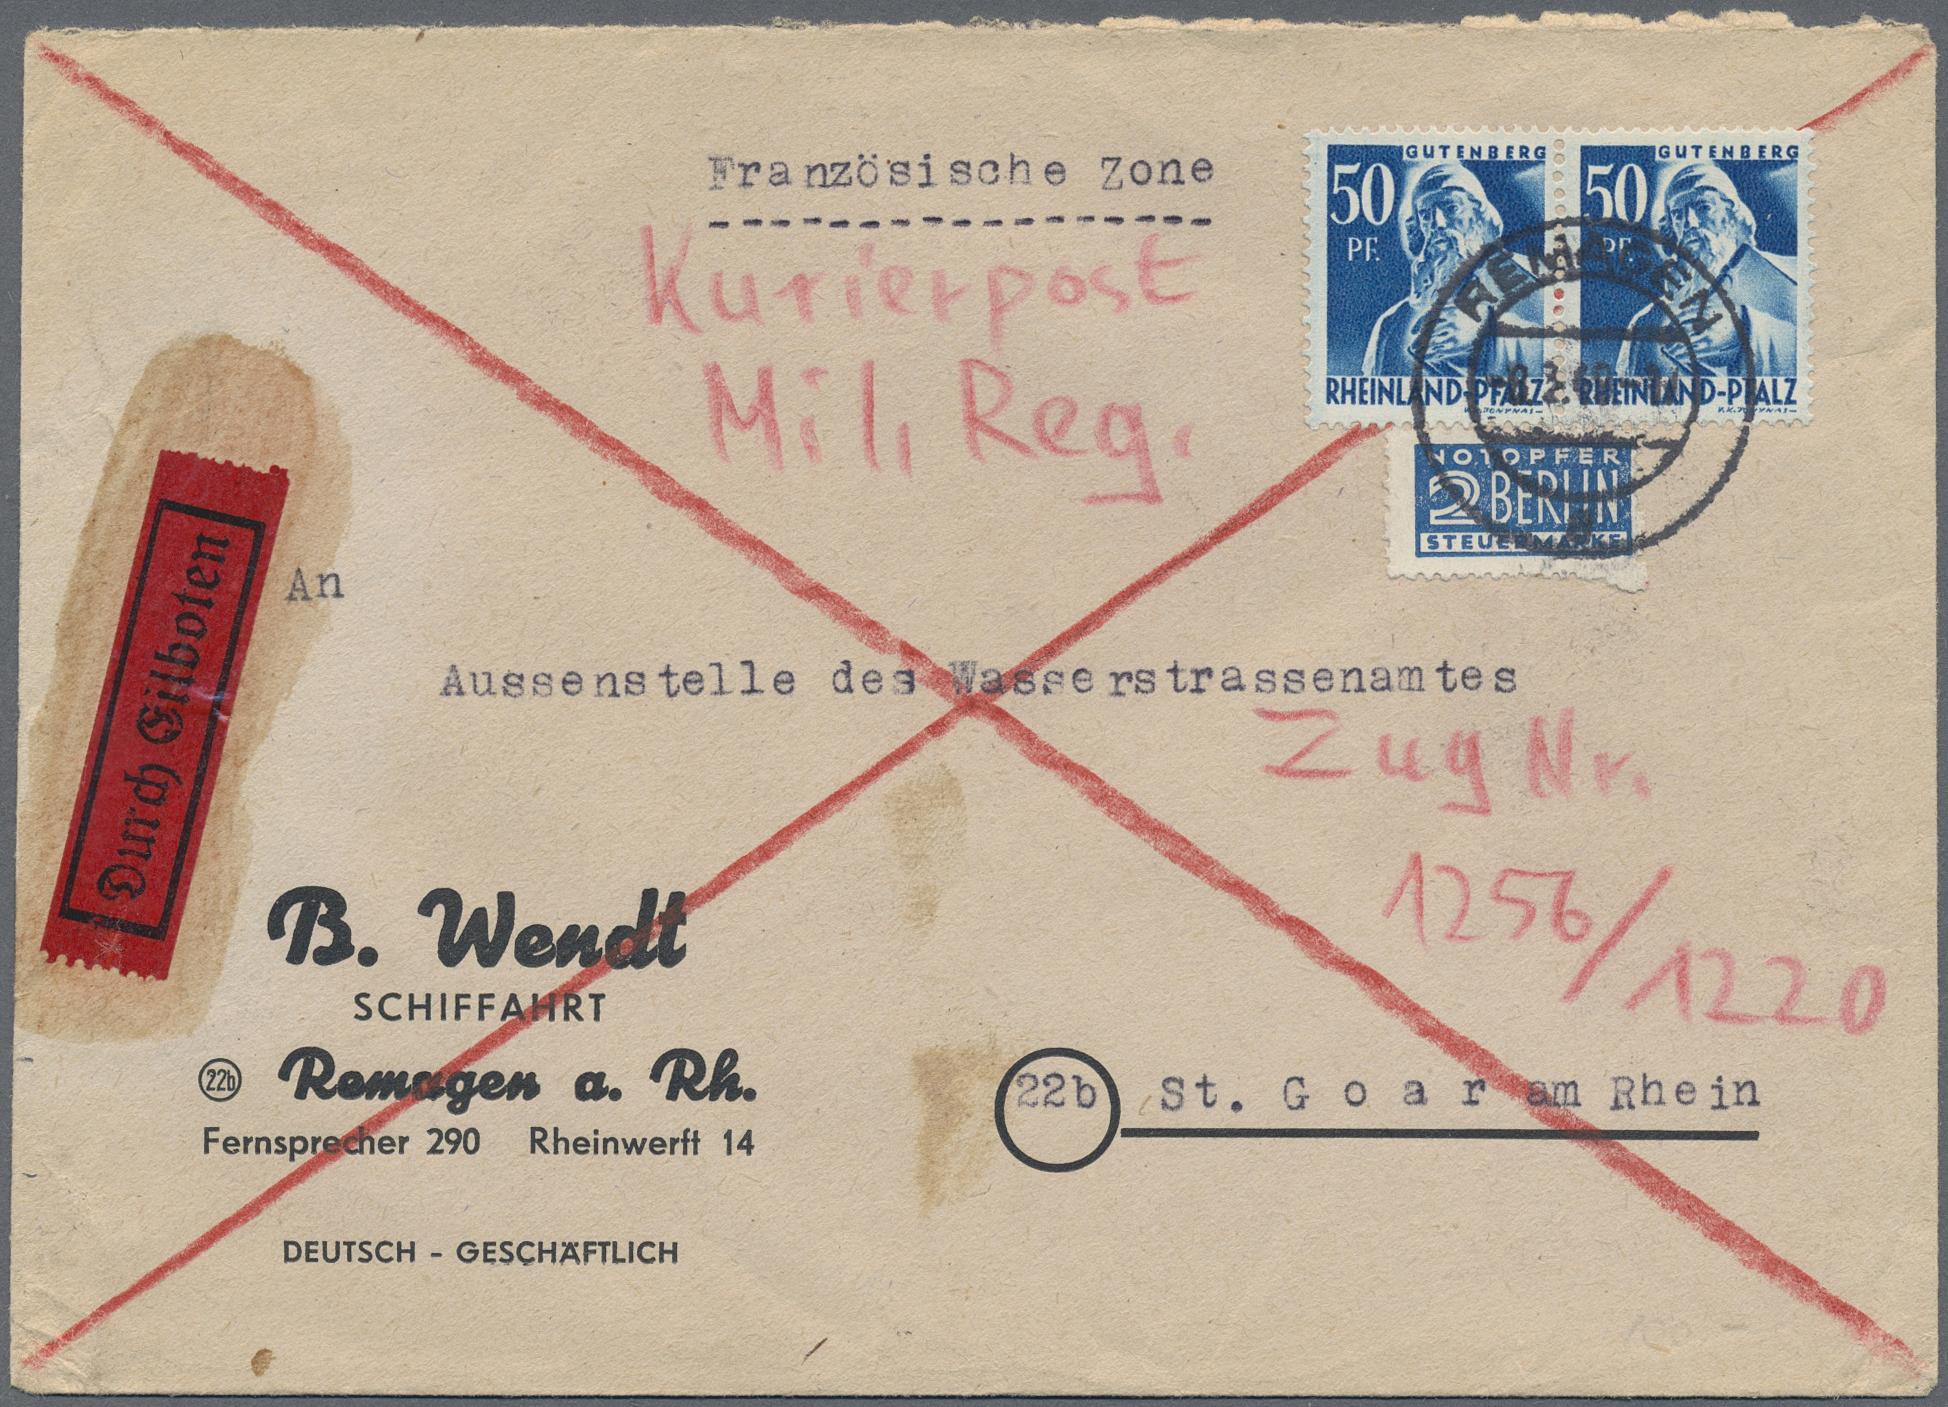 Lot 38259 - Französische Zone - Rheinland Pfalz  -  Auktionshaus Christoph Gärtner GmbH & Co. KG Collections Germany,  Collections Supplement, Surprise boxes #39 Day 7